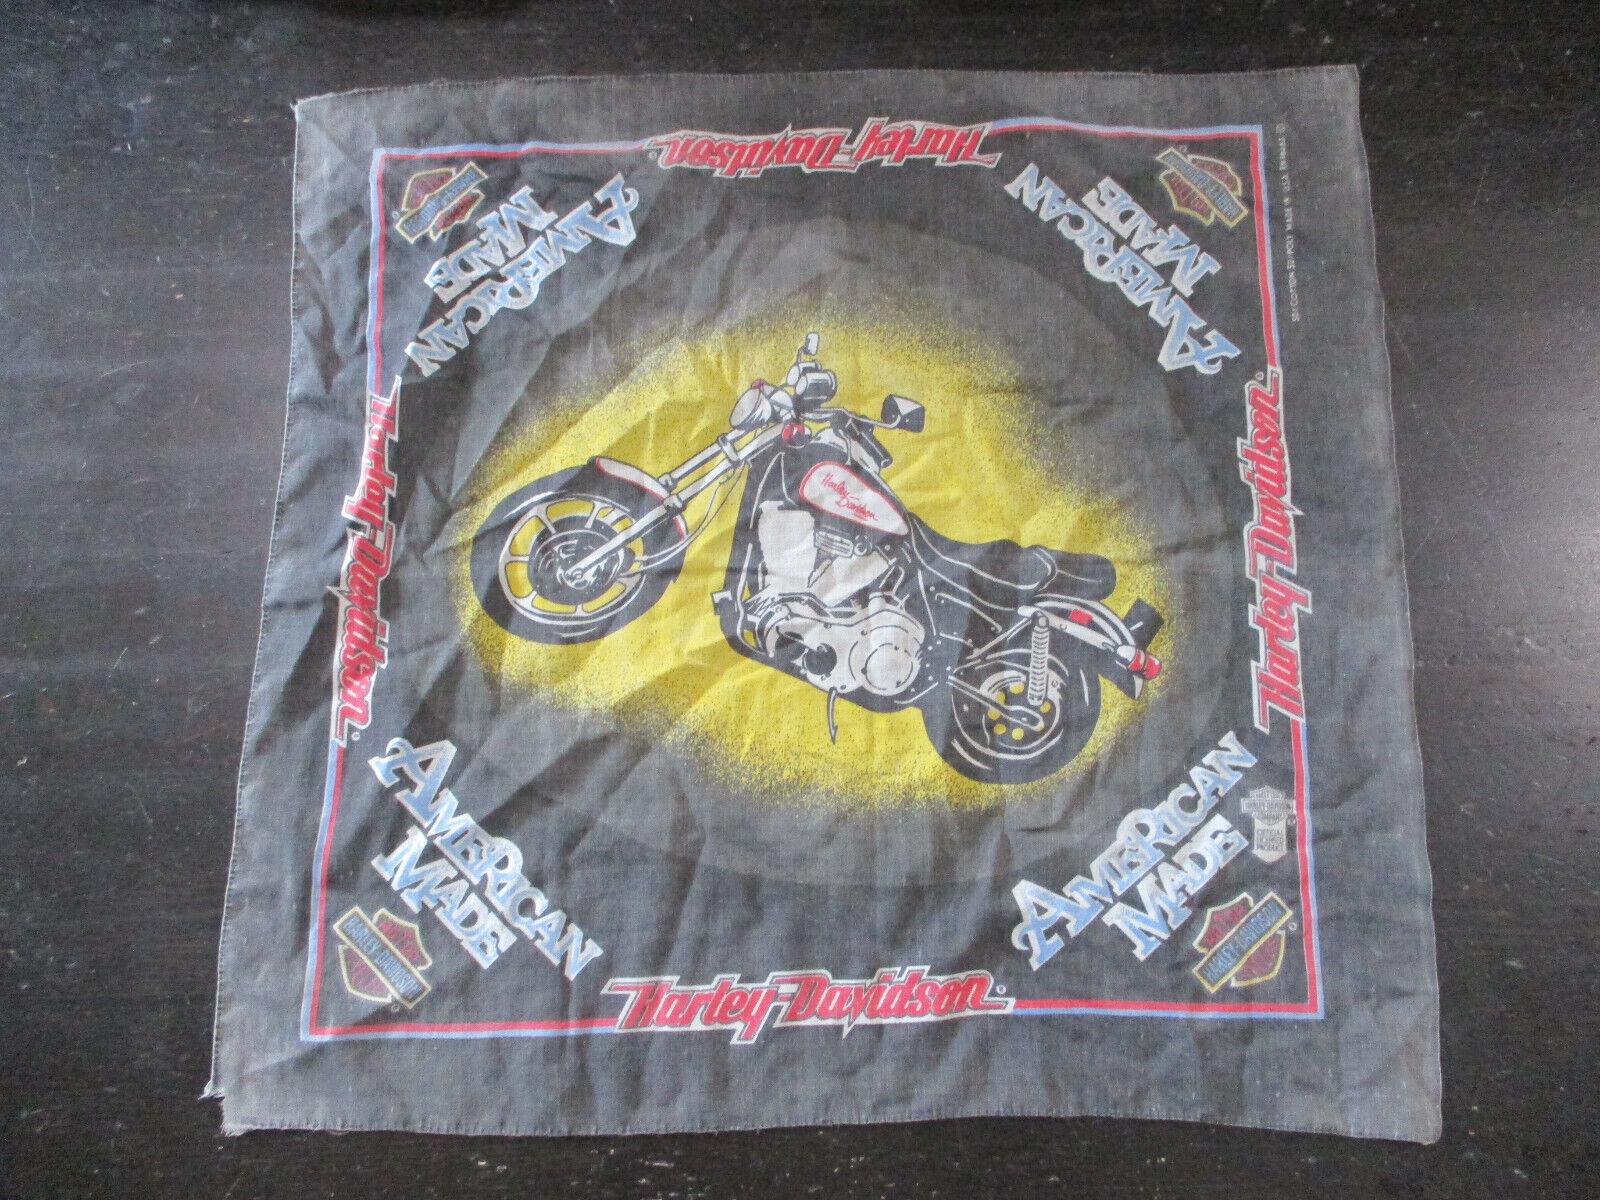 VINTAGE Harley Davidson Bandana Black Red Motorcycle Biker Handkerchief 90s*